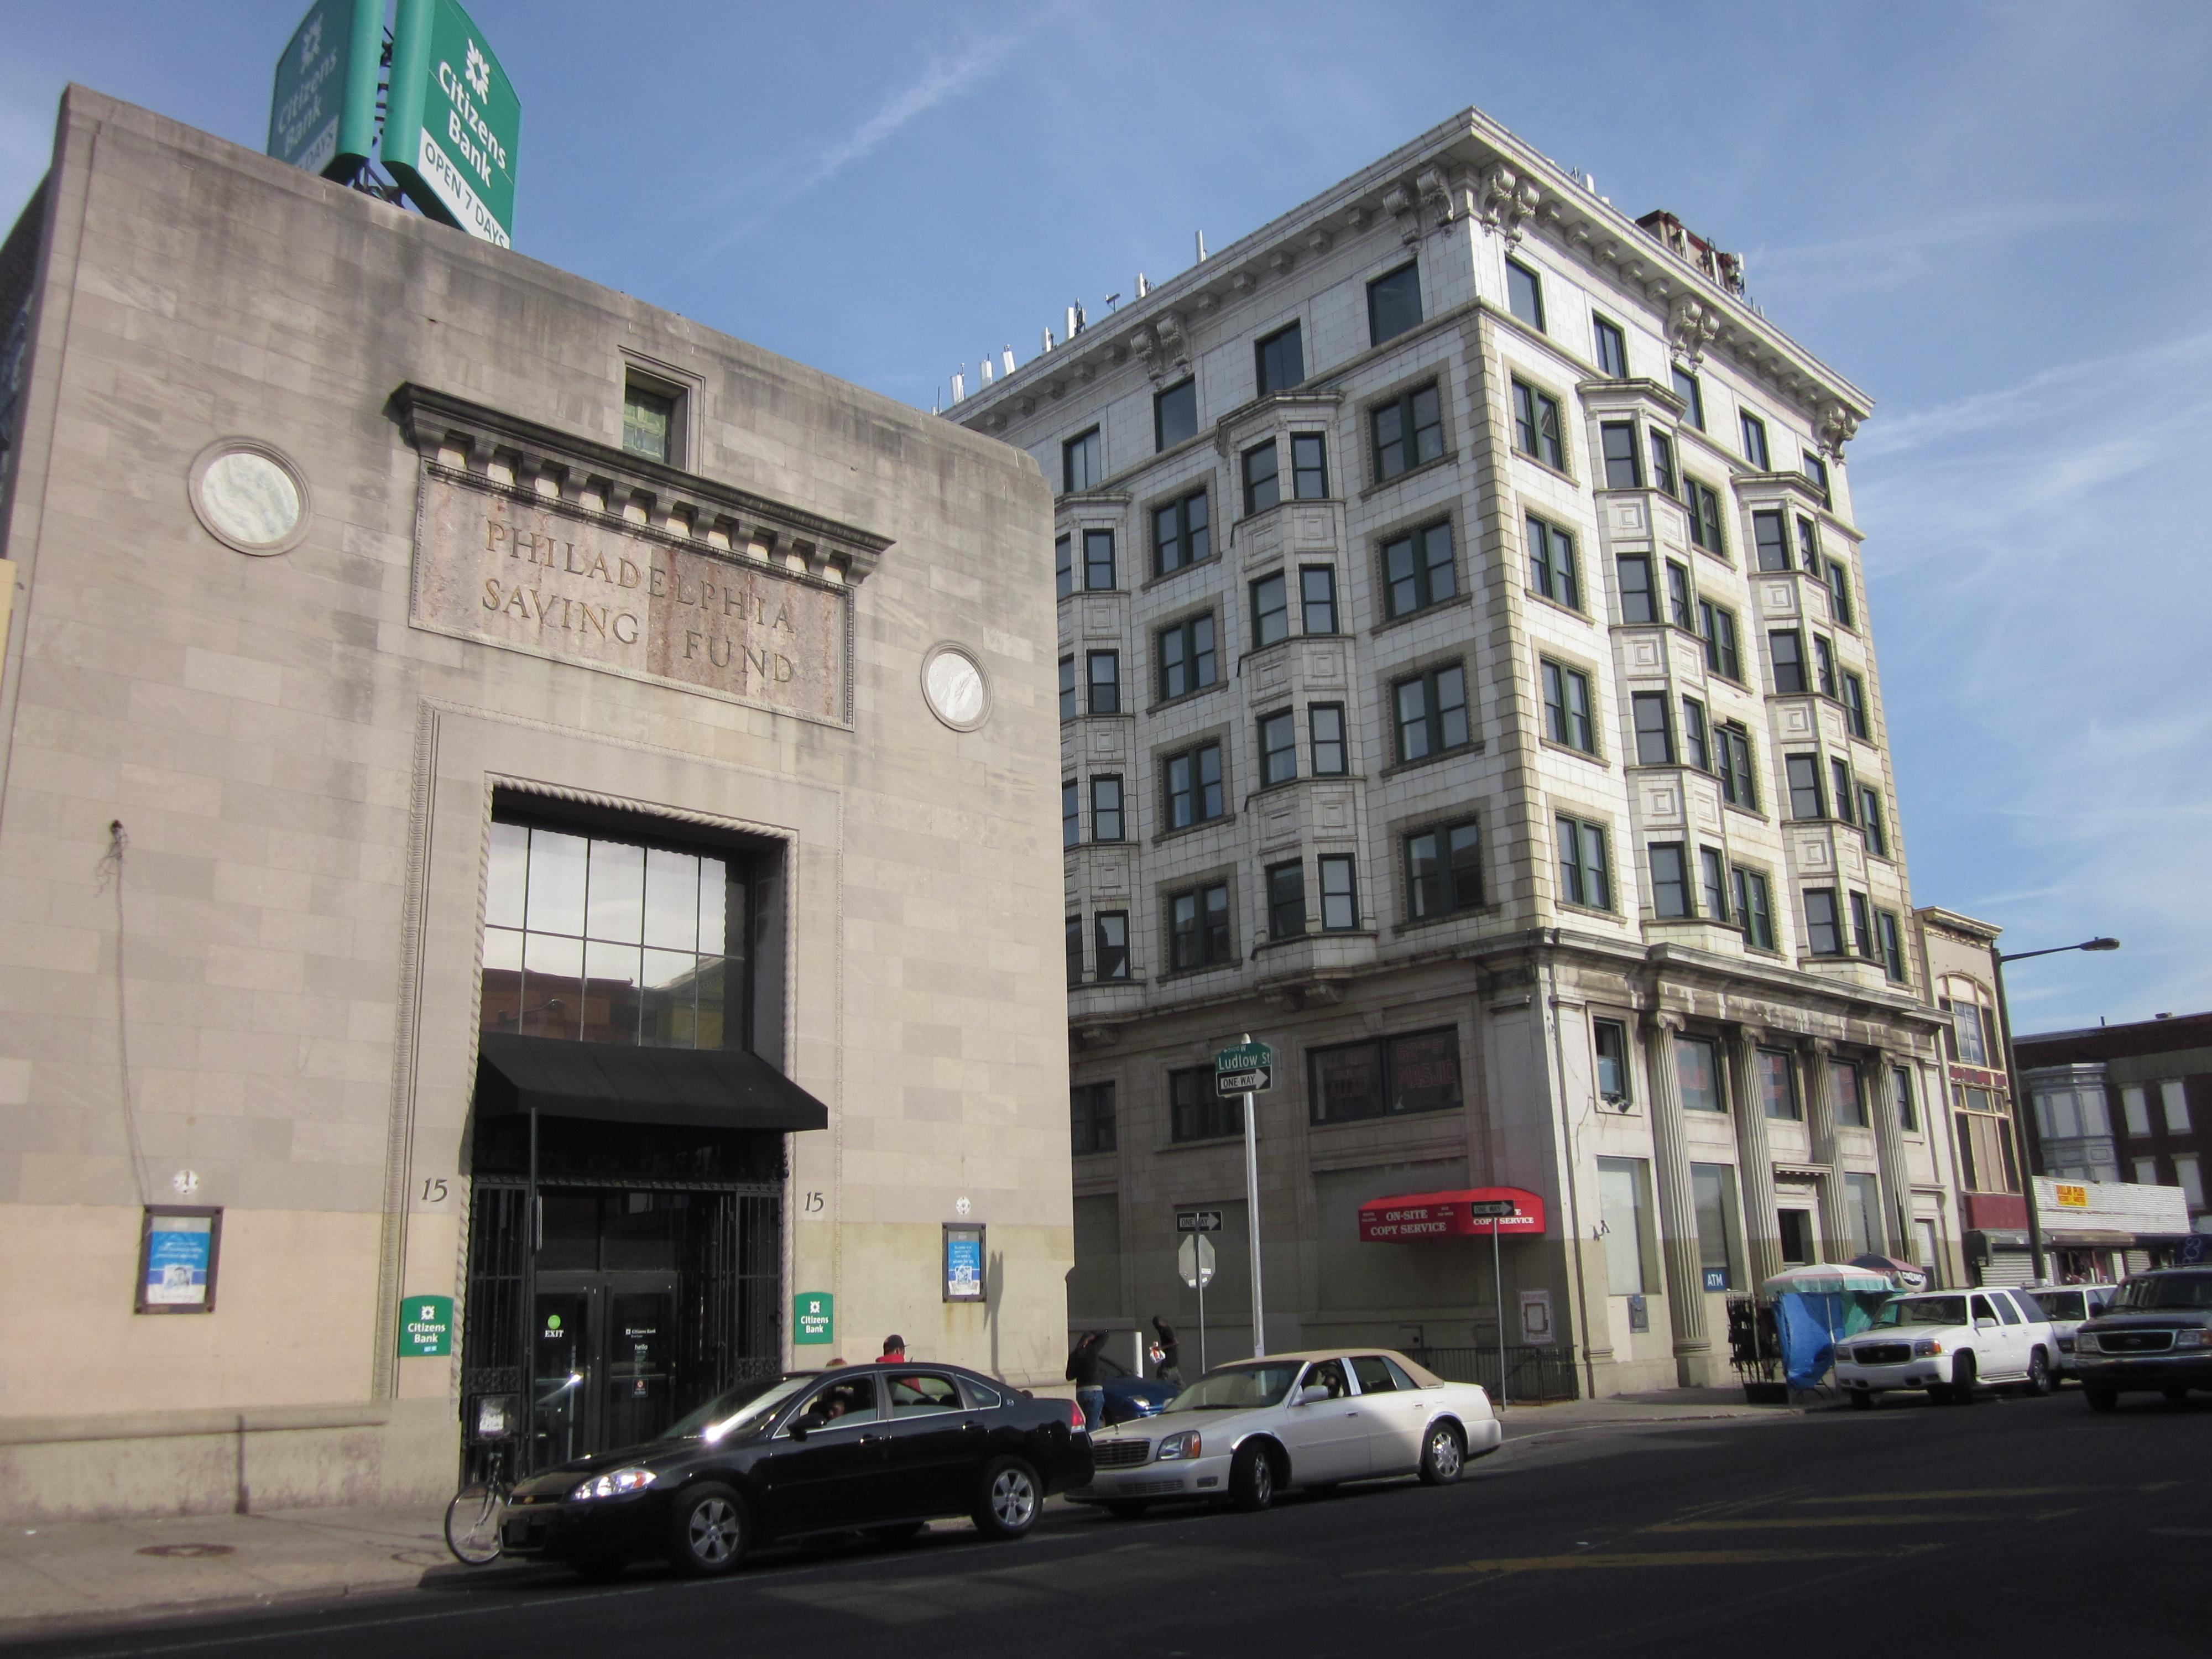 """West Philadelphia's Main Street"", 52nd Street, to become ... Market Street"